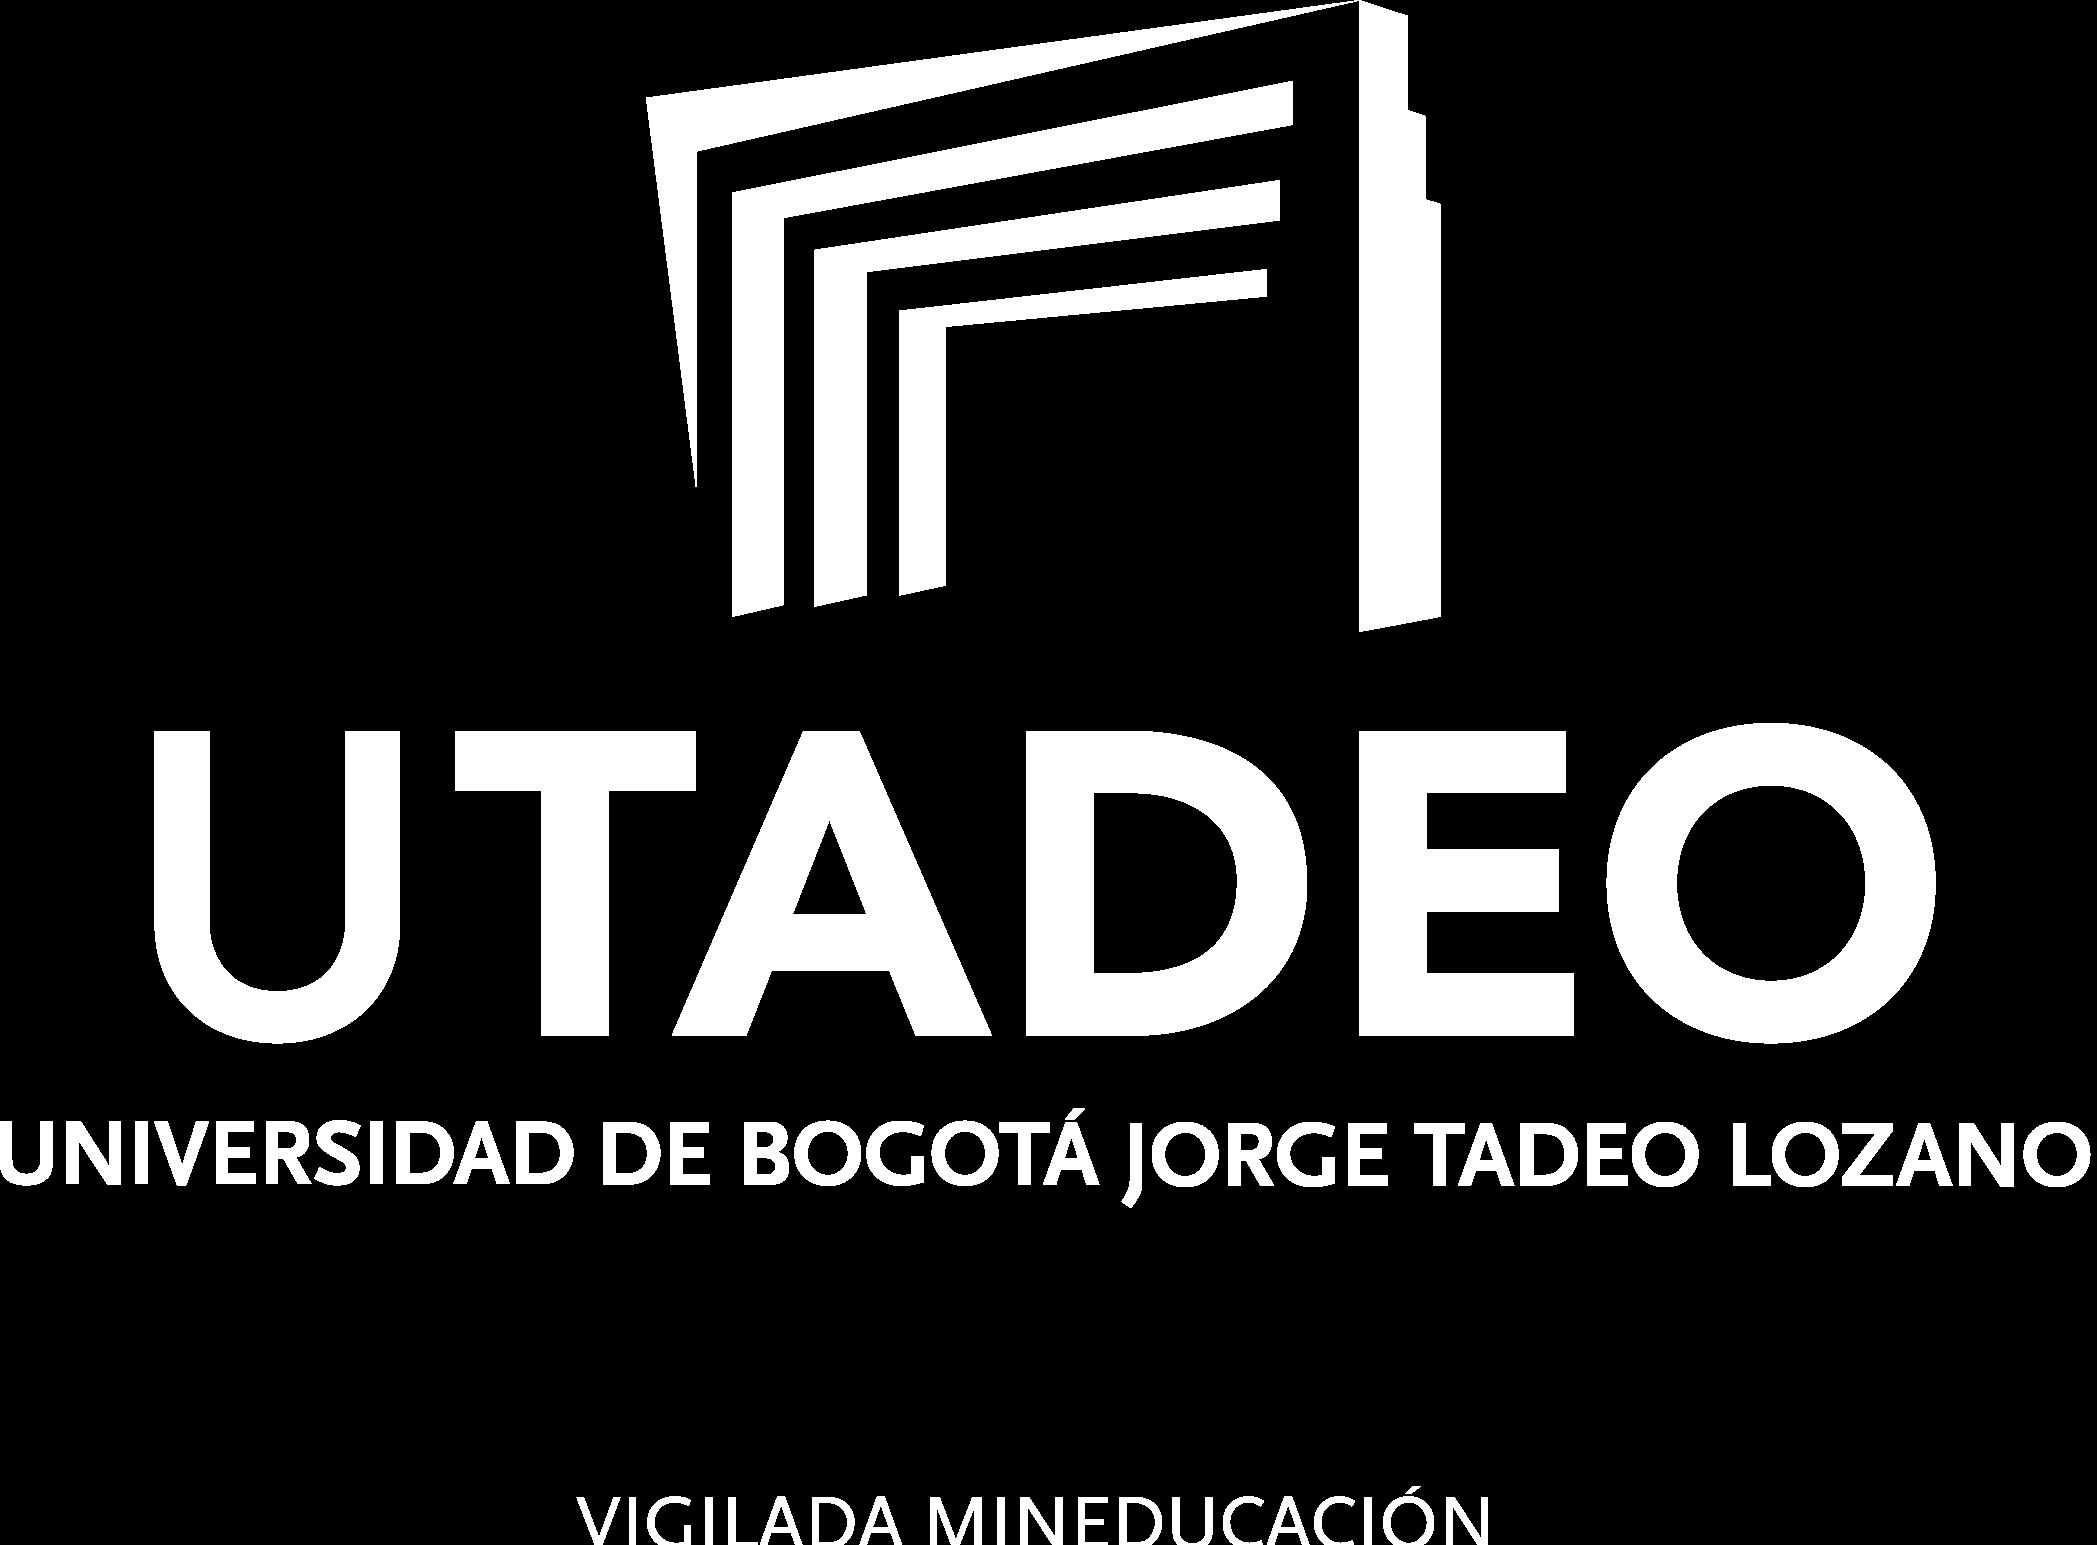 LOGO-UTADEO-BLANCO